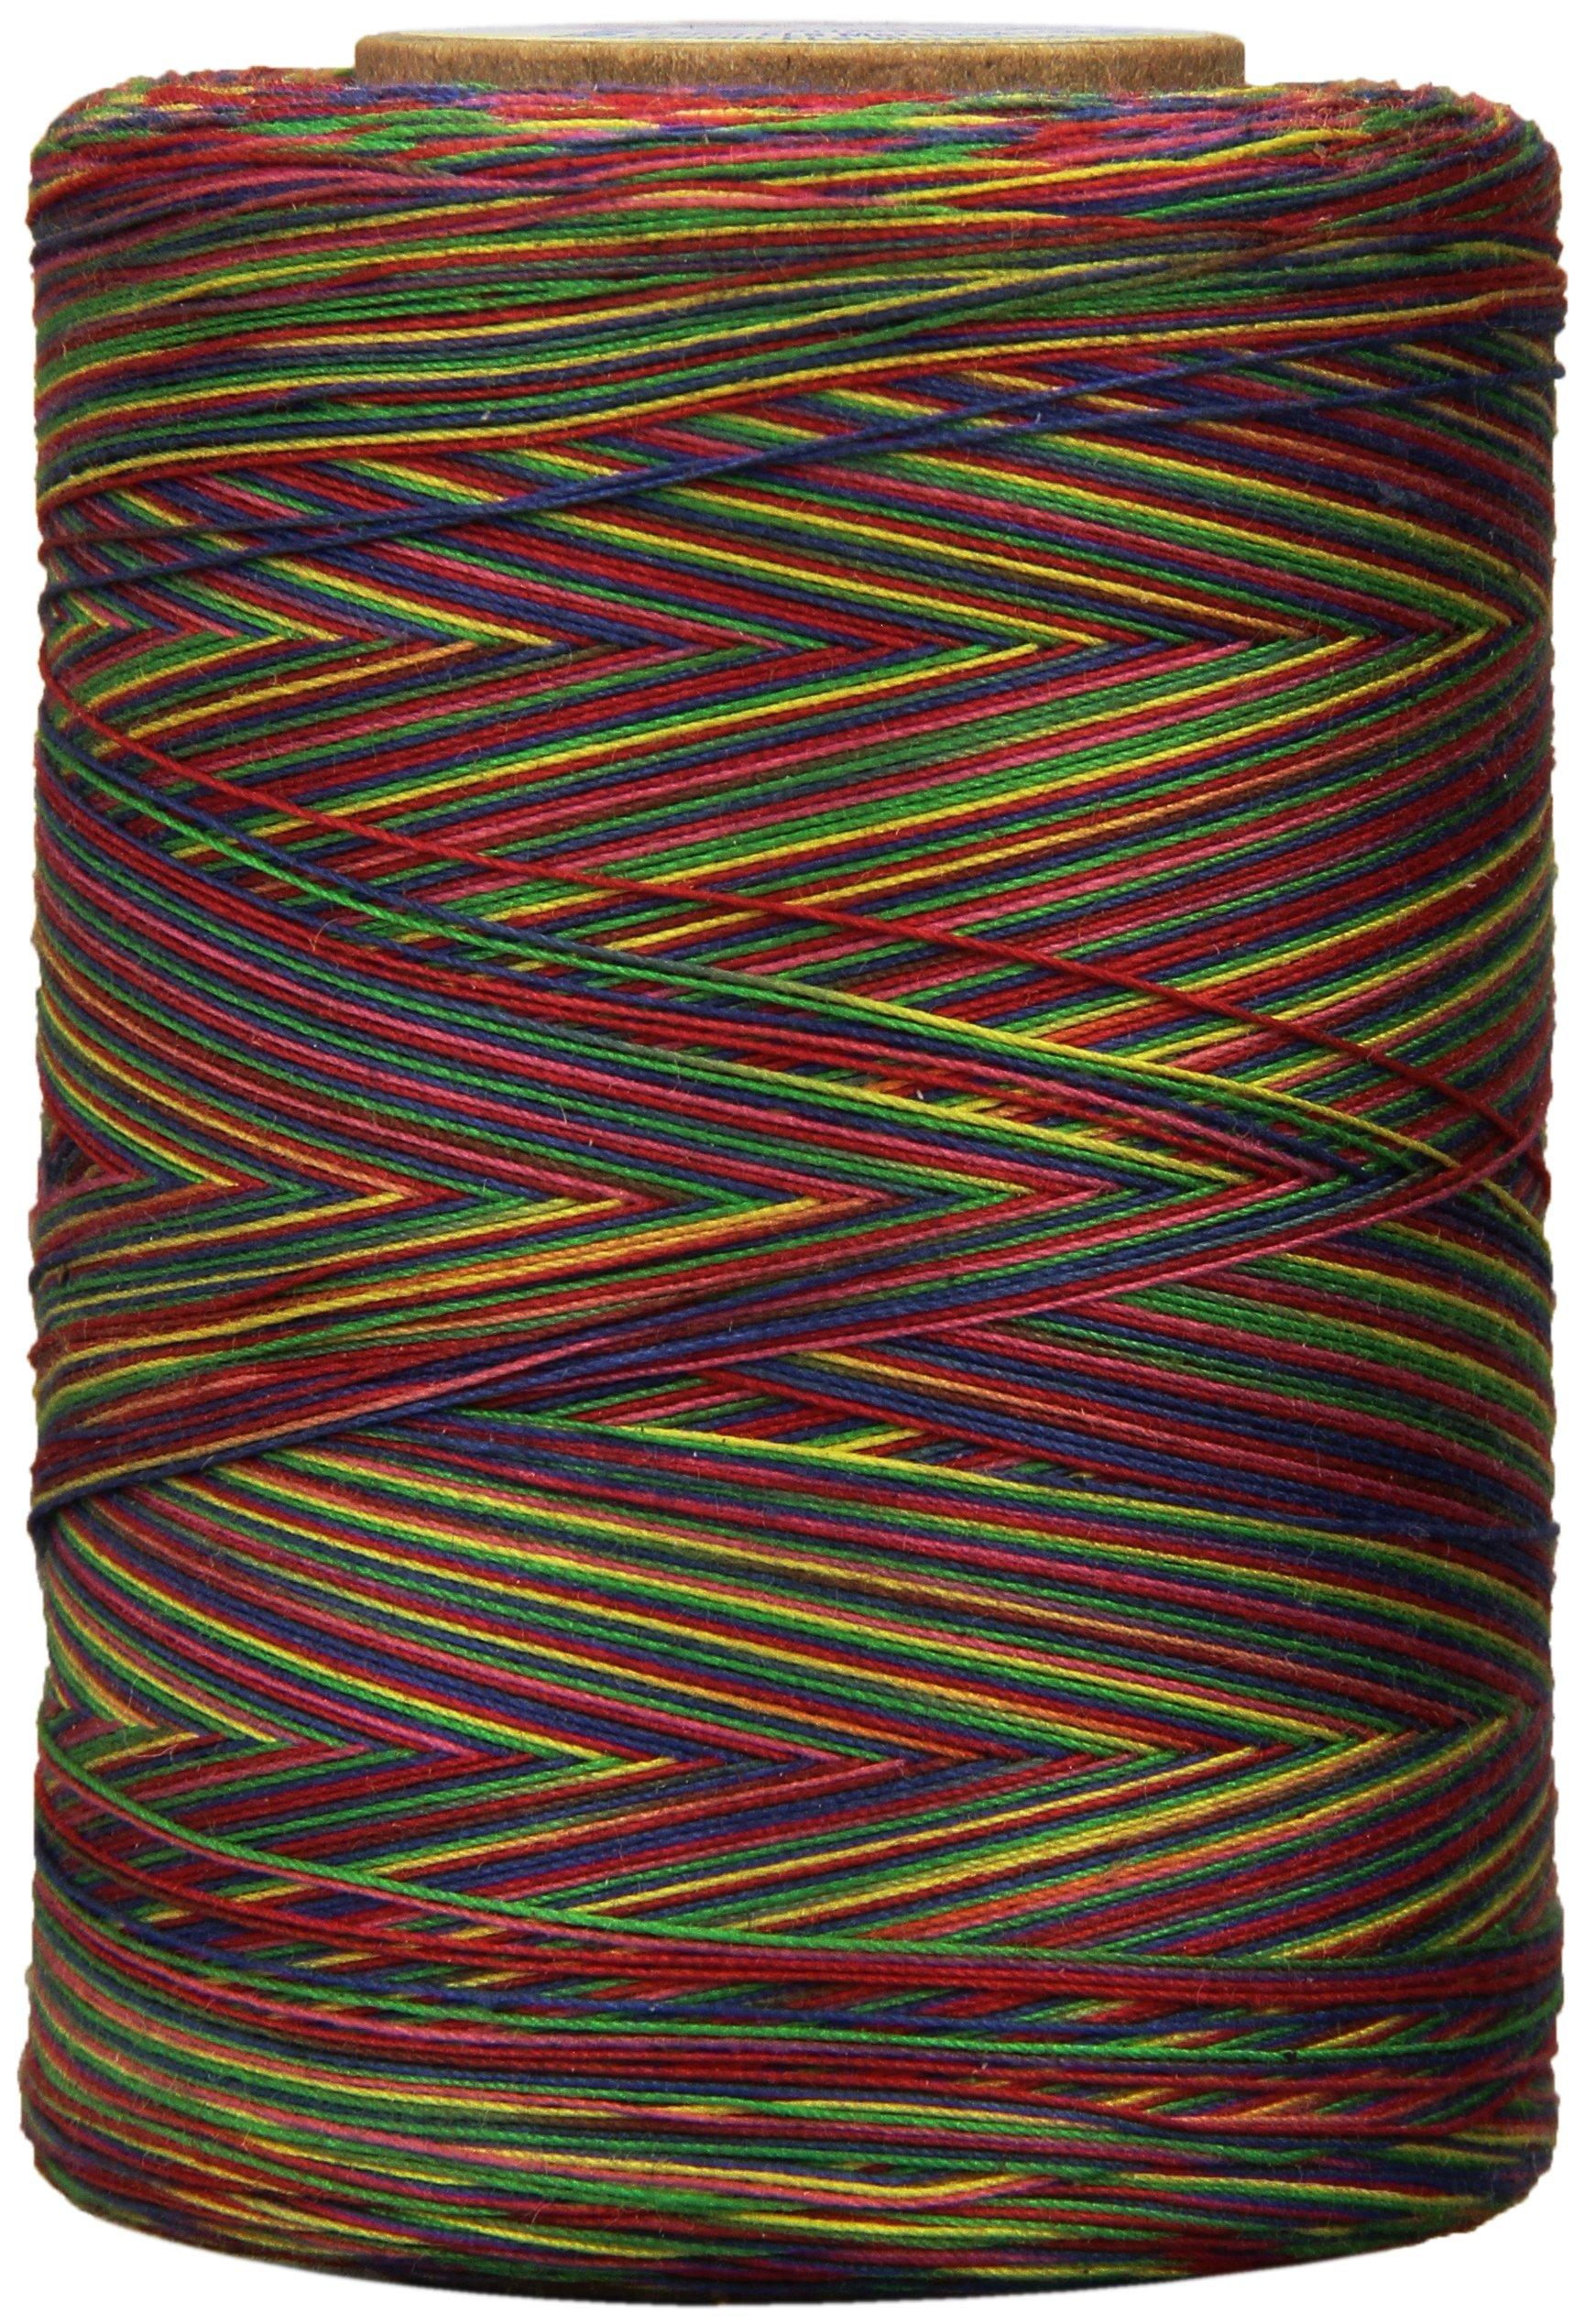 Coats: Thread & Zippers V38-813 Star Mercerized